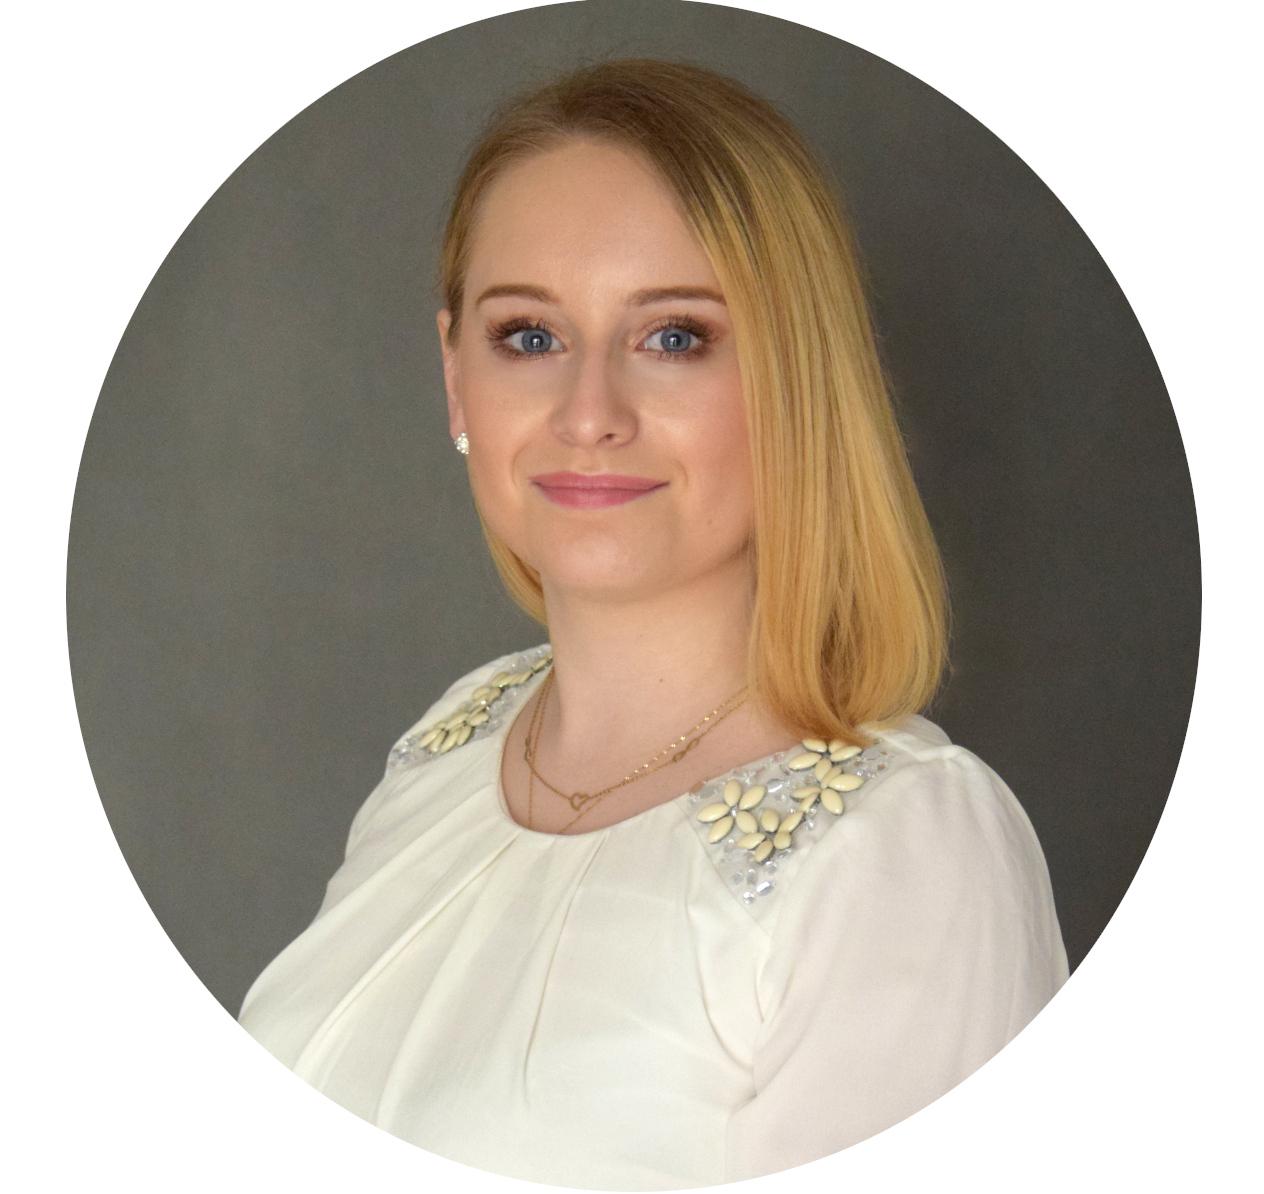 Basia Leszczyńska